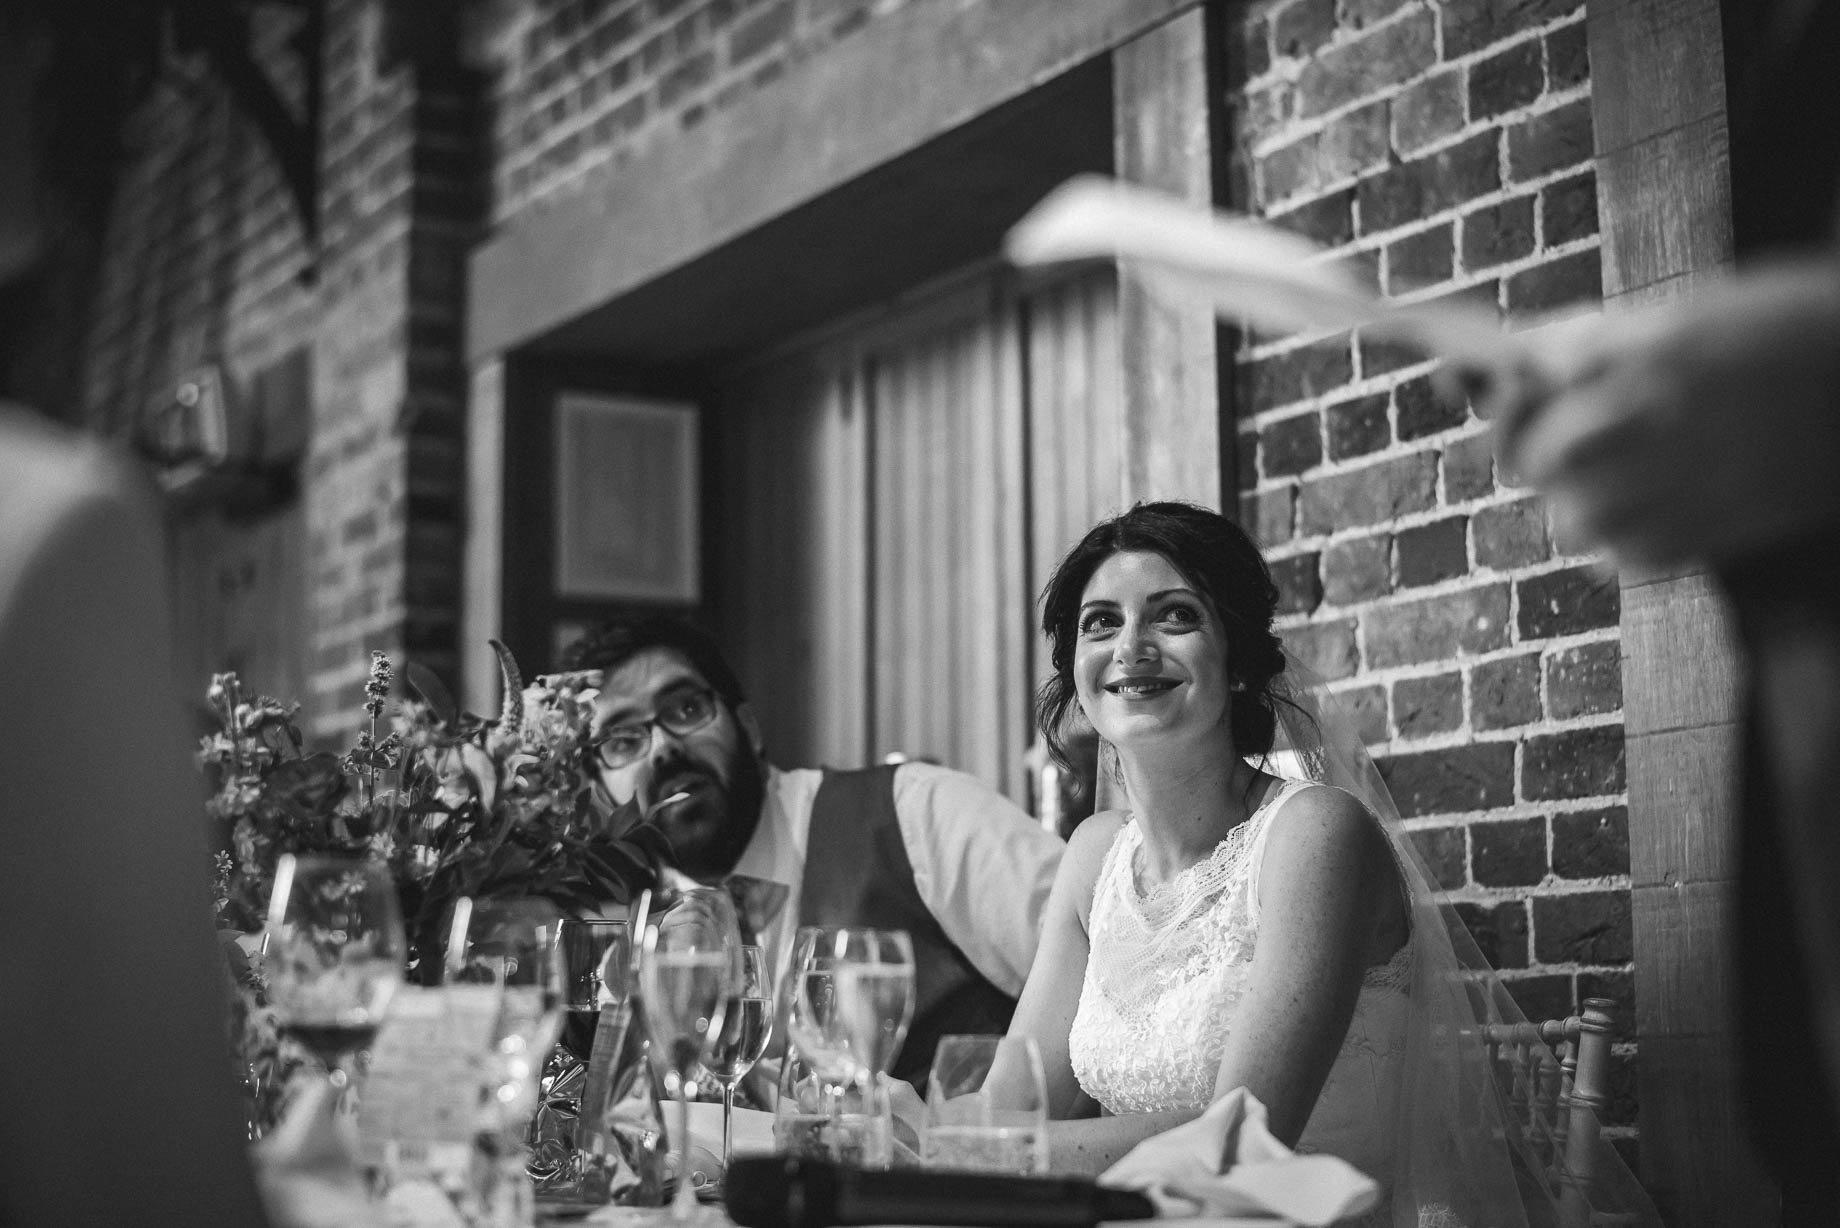 Gaynes Park wedding photography - Guy Collier Photography - Rachel and Jon (113 of 169)